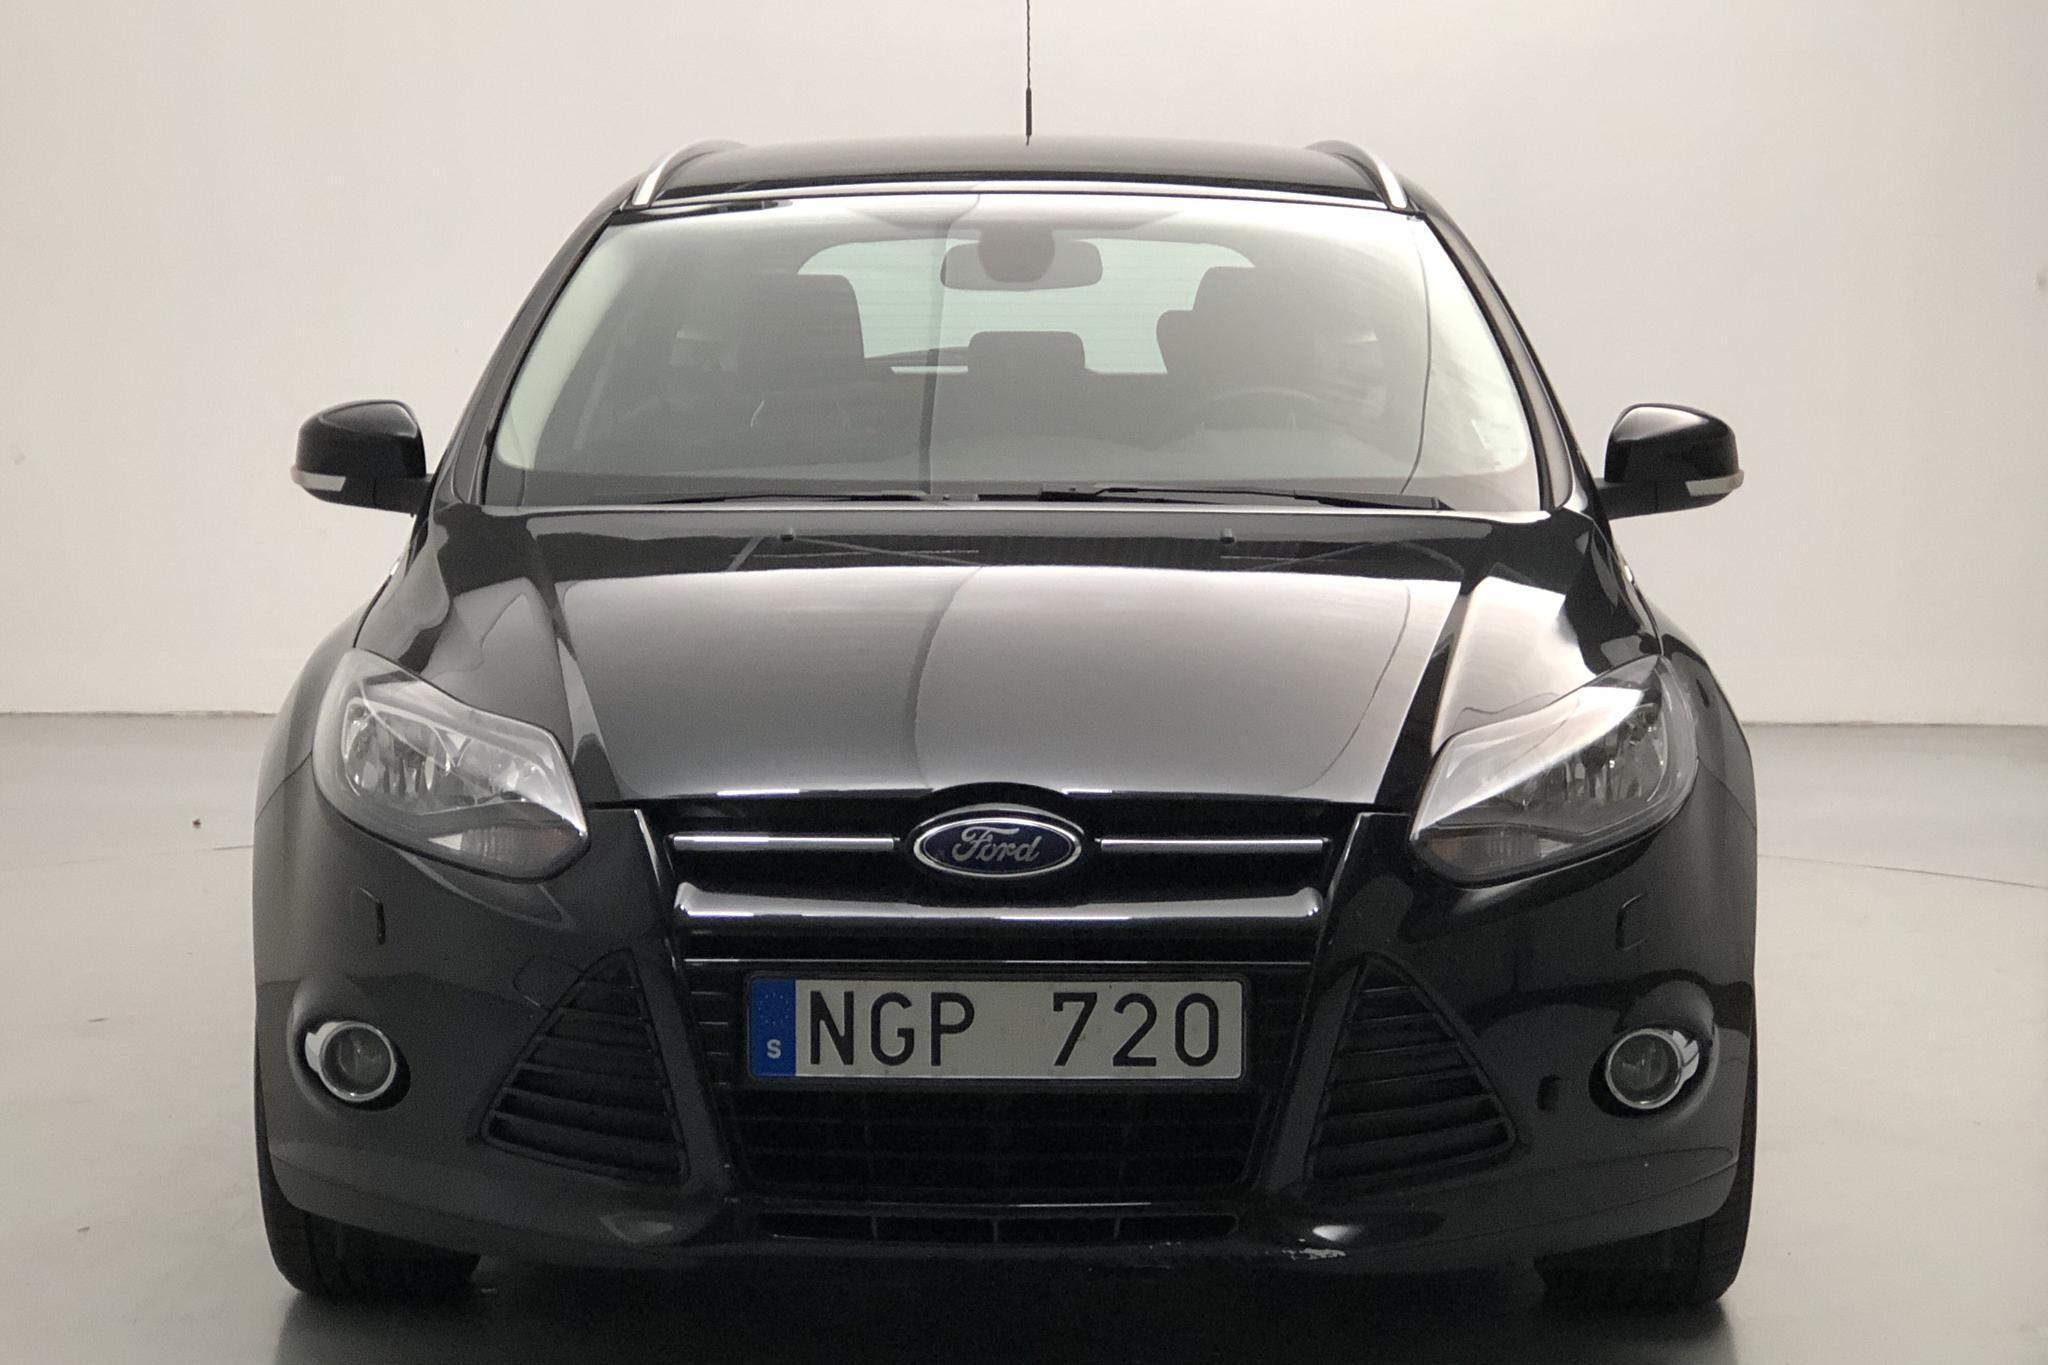 Ford Focus 1.0 EcoBoost Kombi (125hk) - 9 045 mil - Manuell - svart - 2013